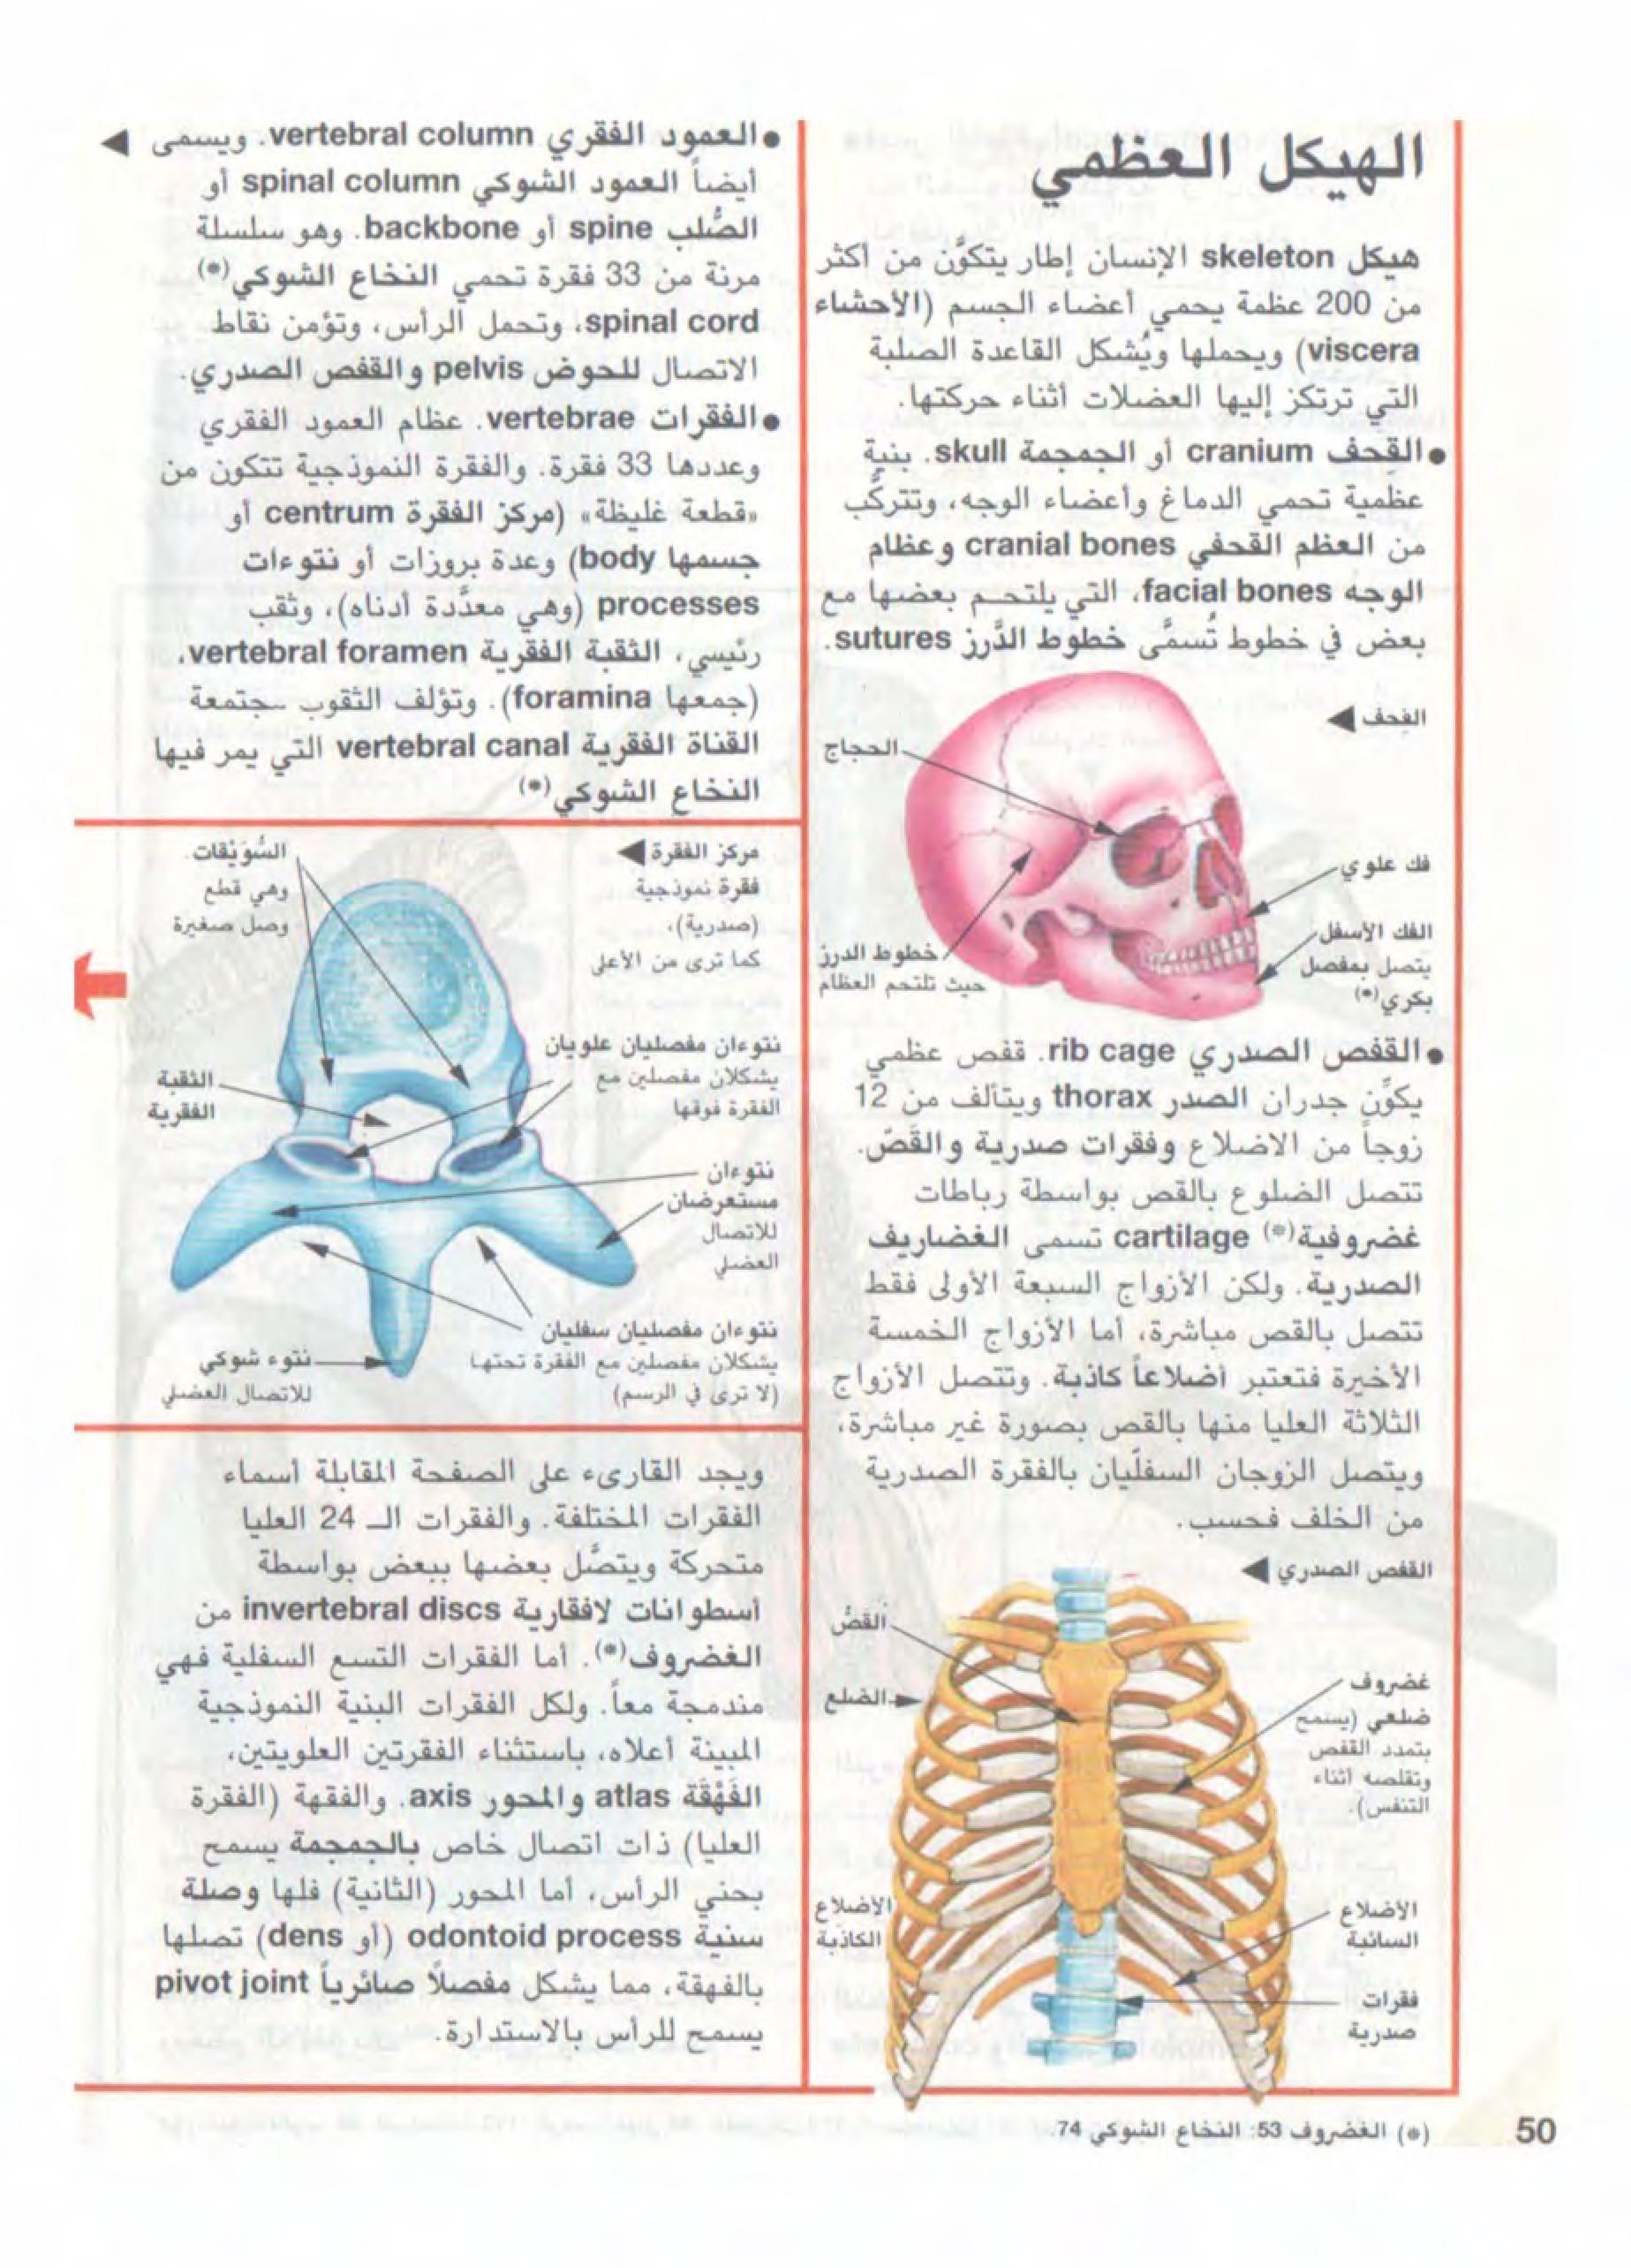 معجم البيولوجيا المصور Free Download Borrow And Streaming Internet Archive Medical Photos Food Photography Background My Books